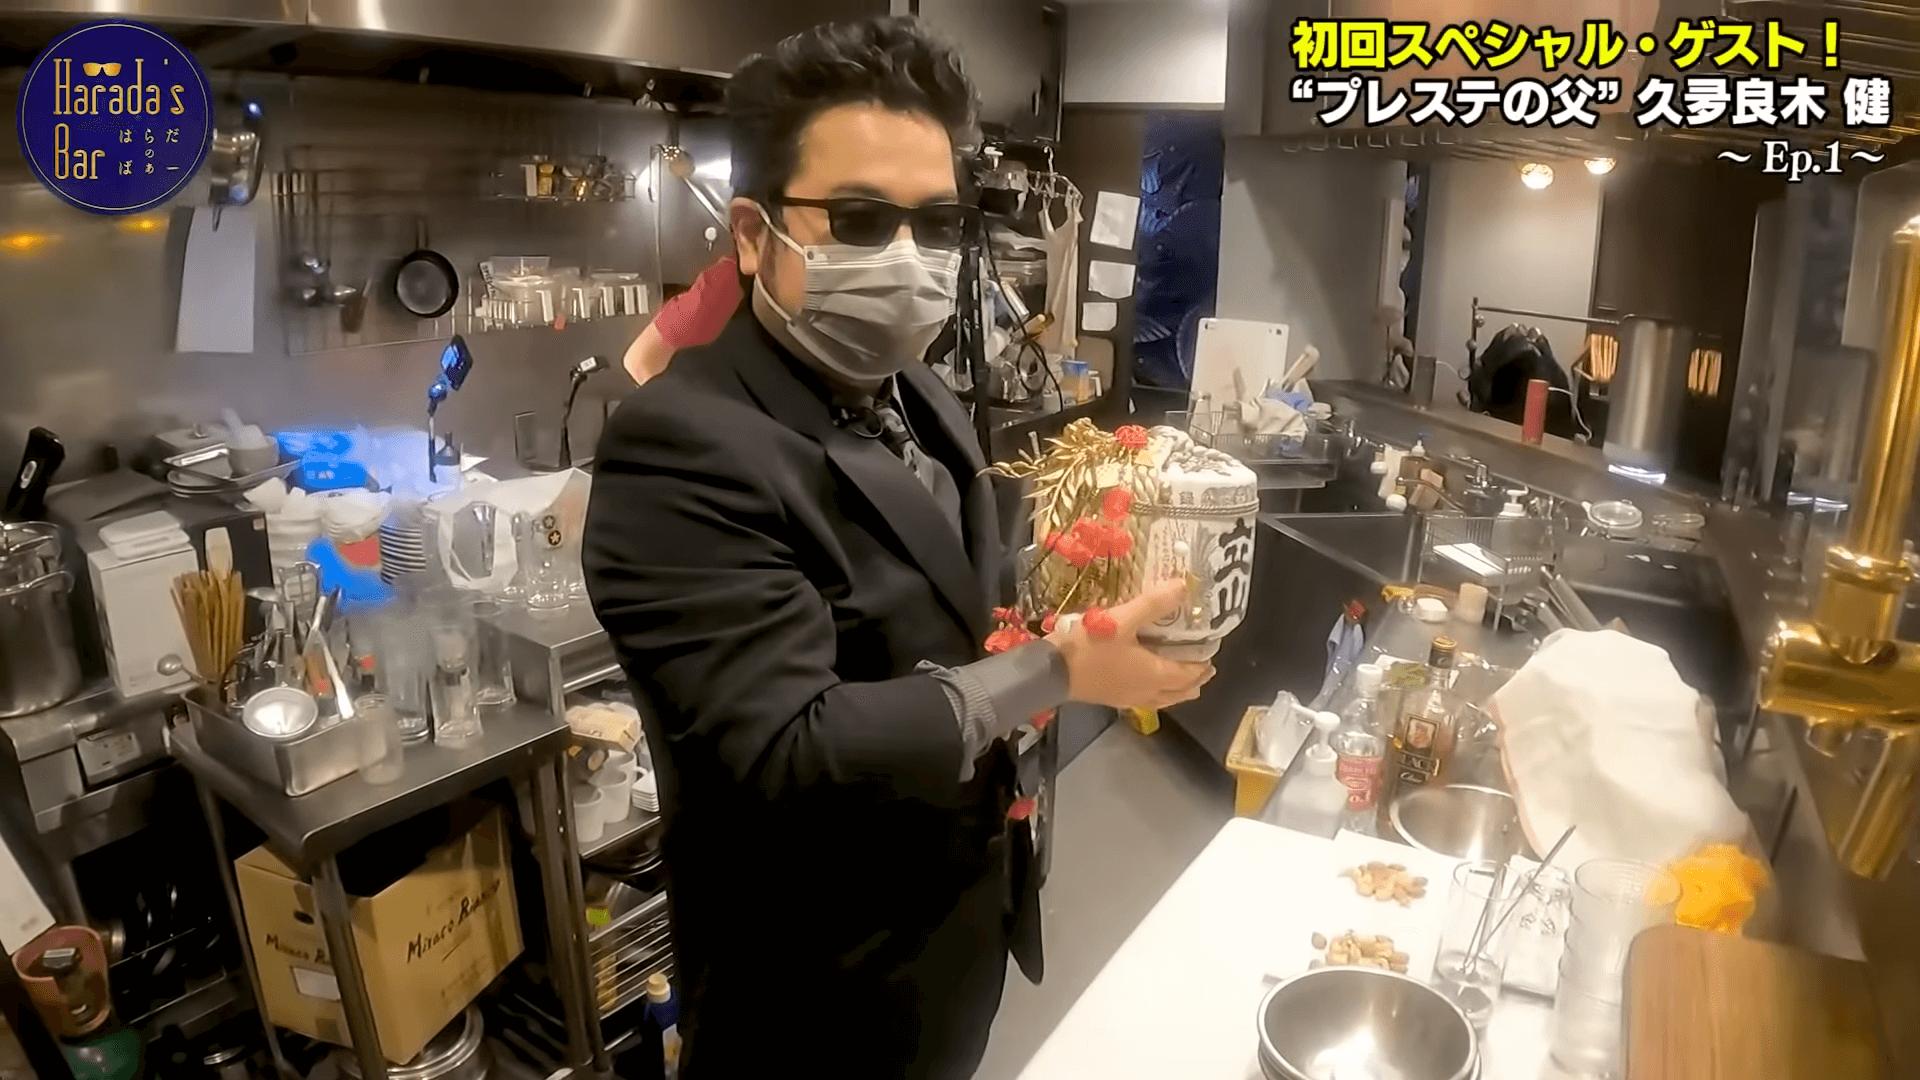 Tekken Producer Katsuhiro Harada Presents His New Talk Show